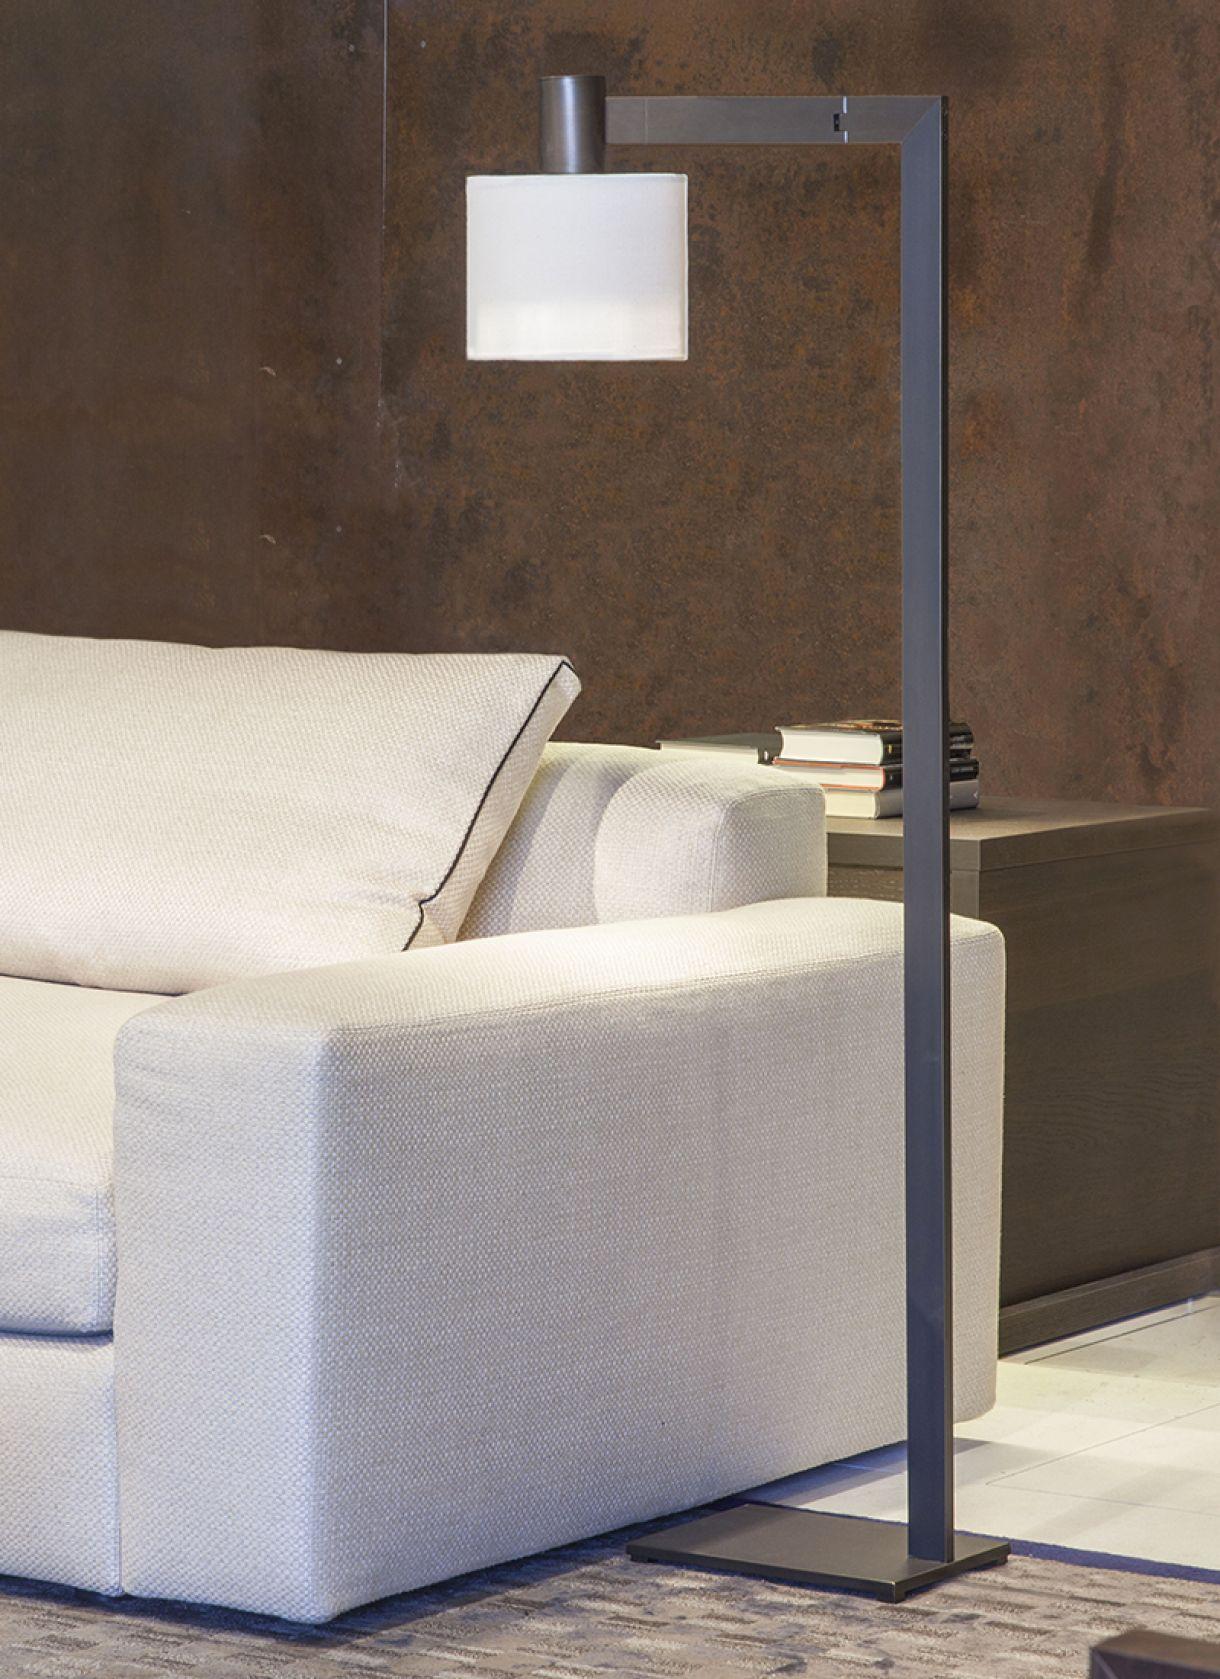 Mahari Joy, refined floor lamp with simple lampshade